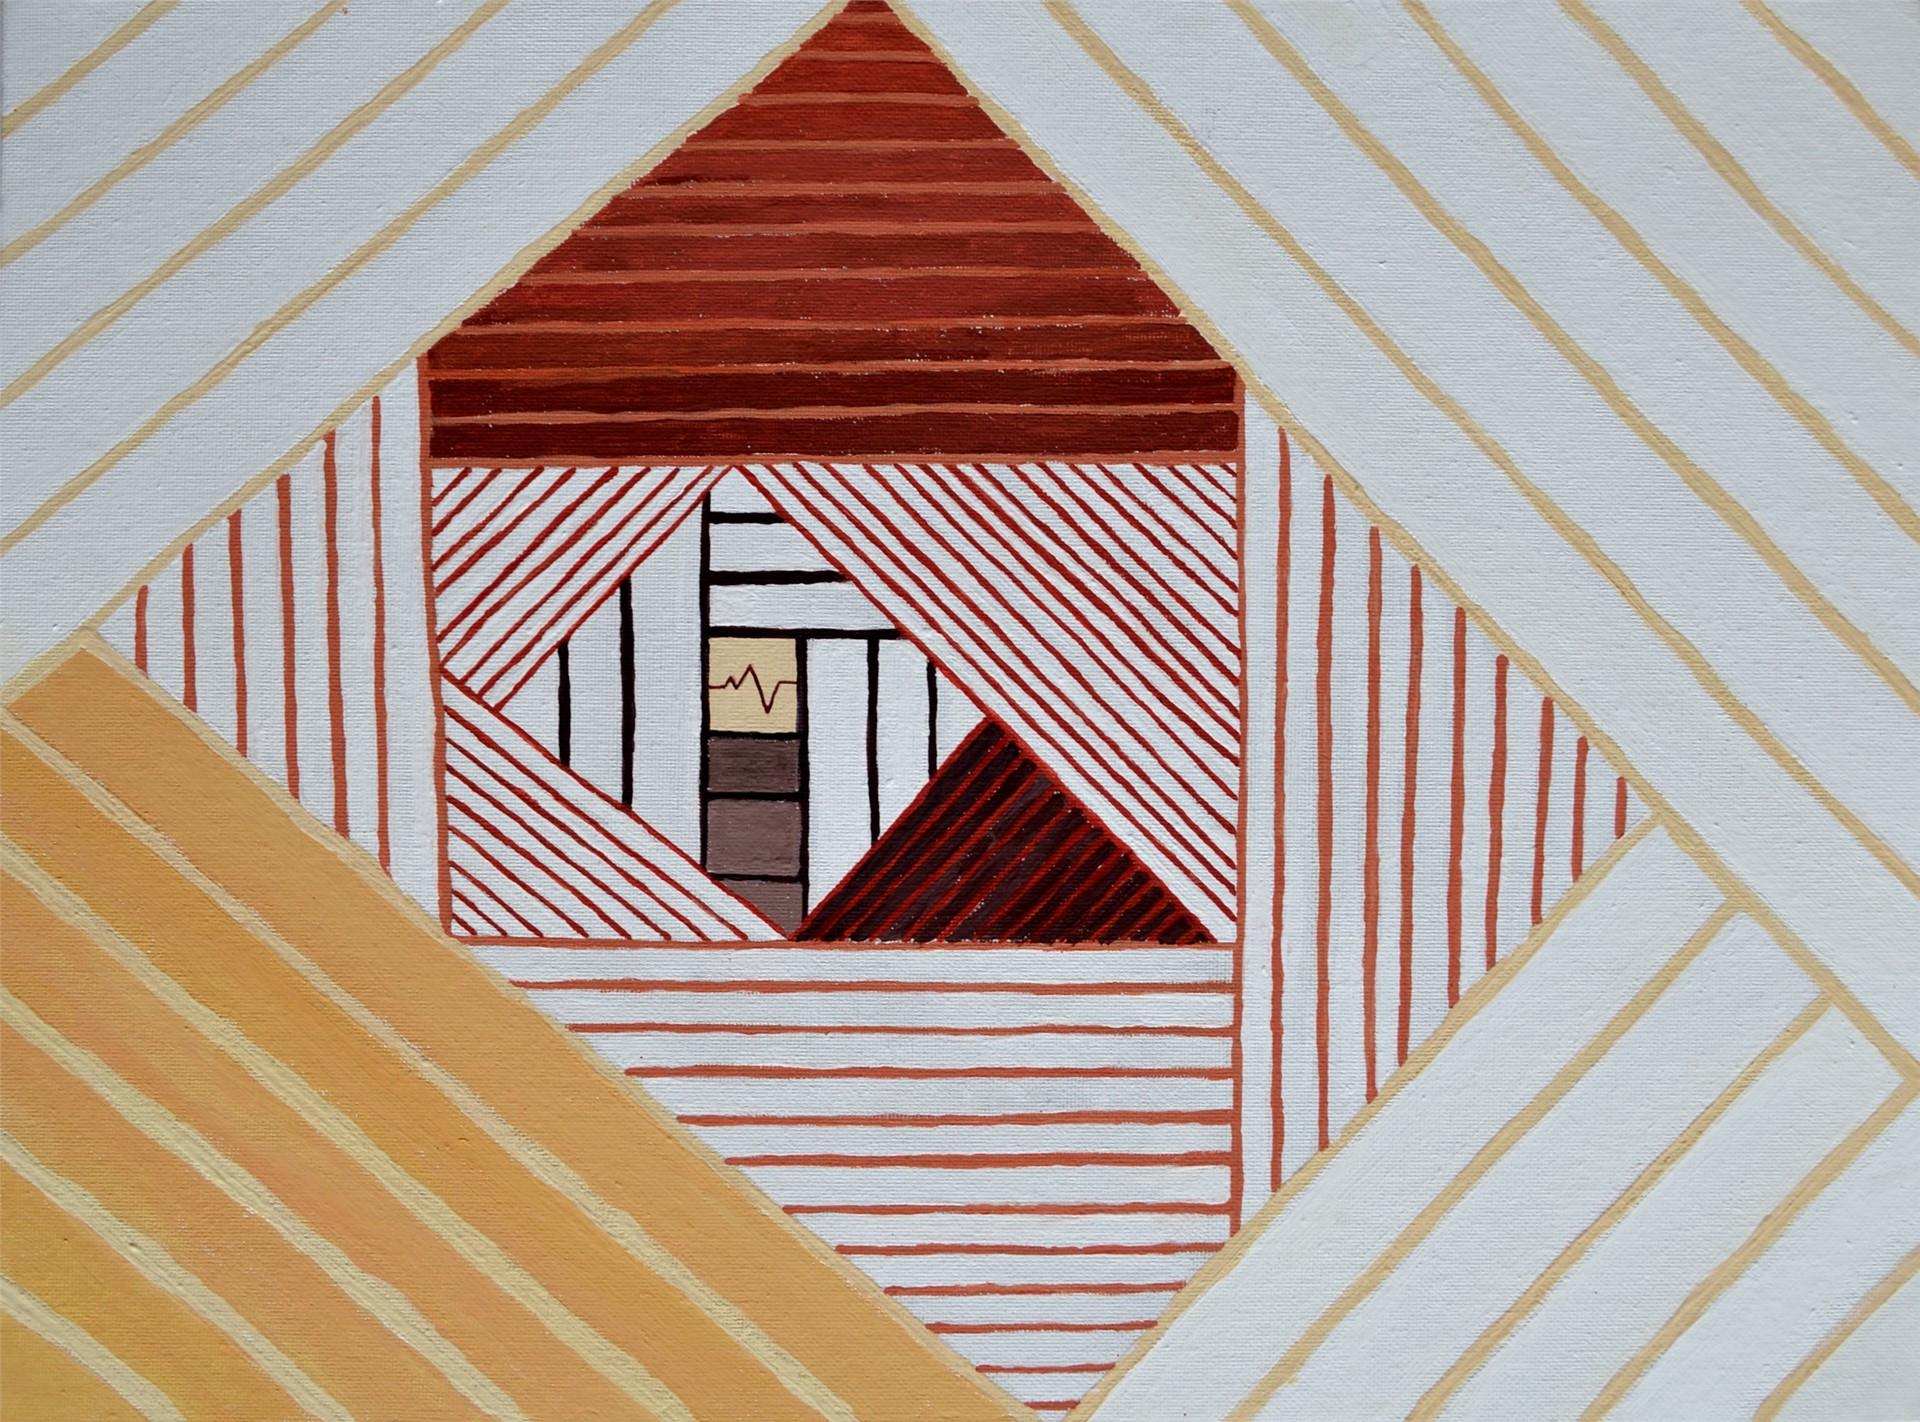 Shyann Krobetzky, Color Wheel Line Project, acrylic on canvas board, March 2016